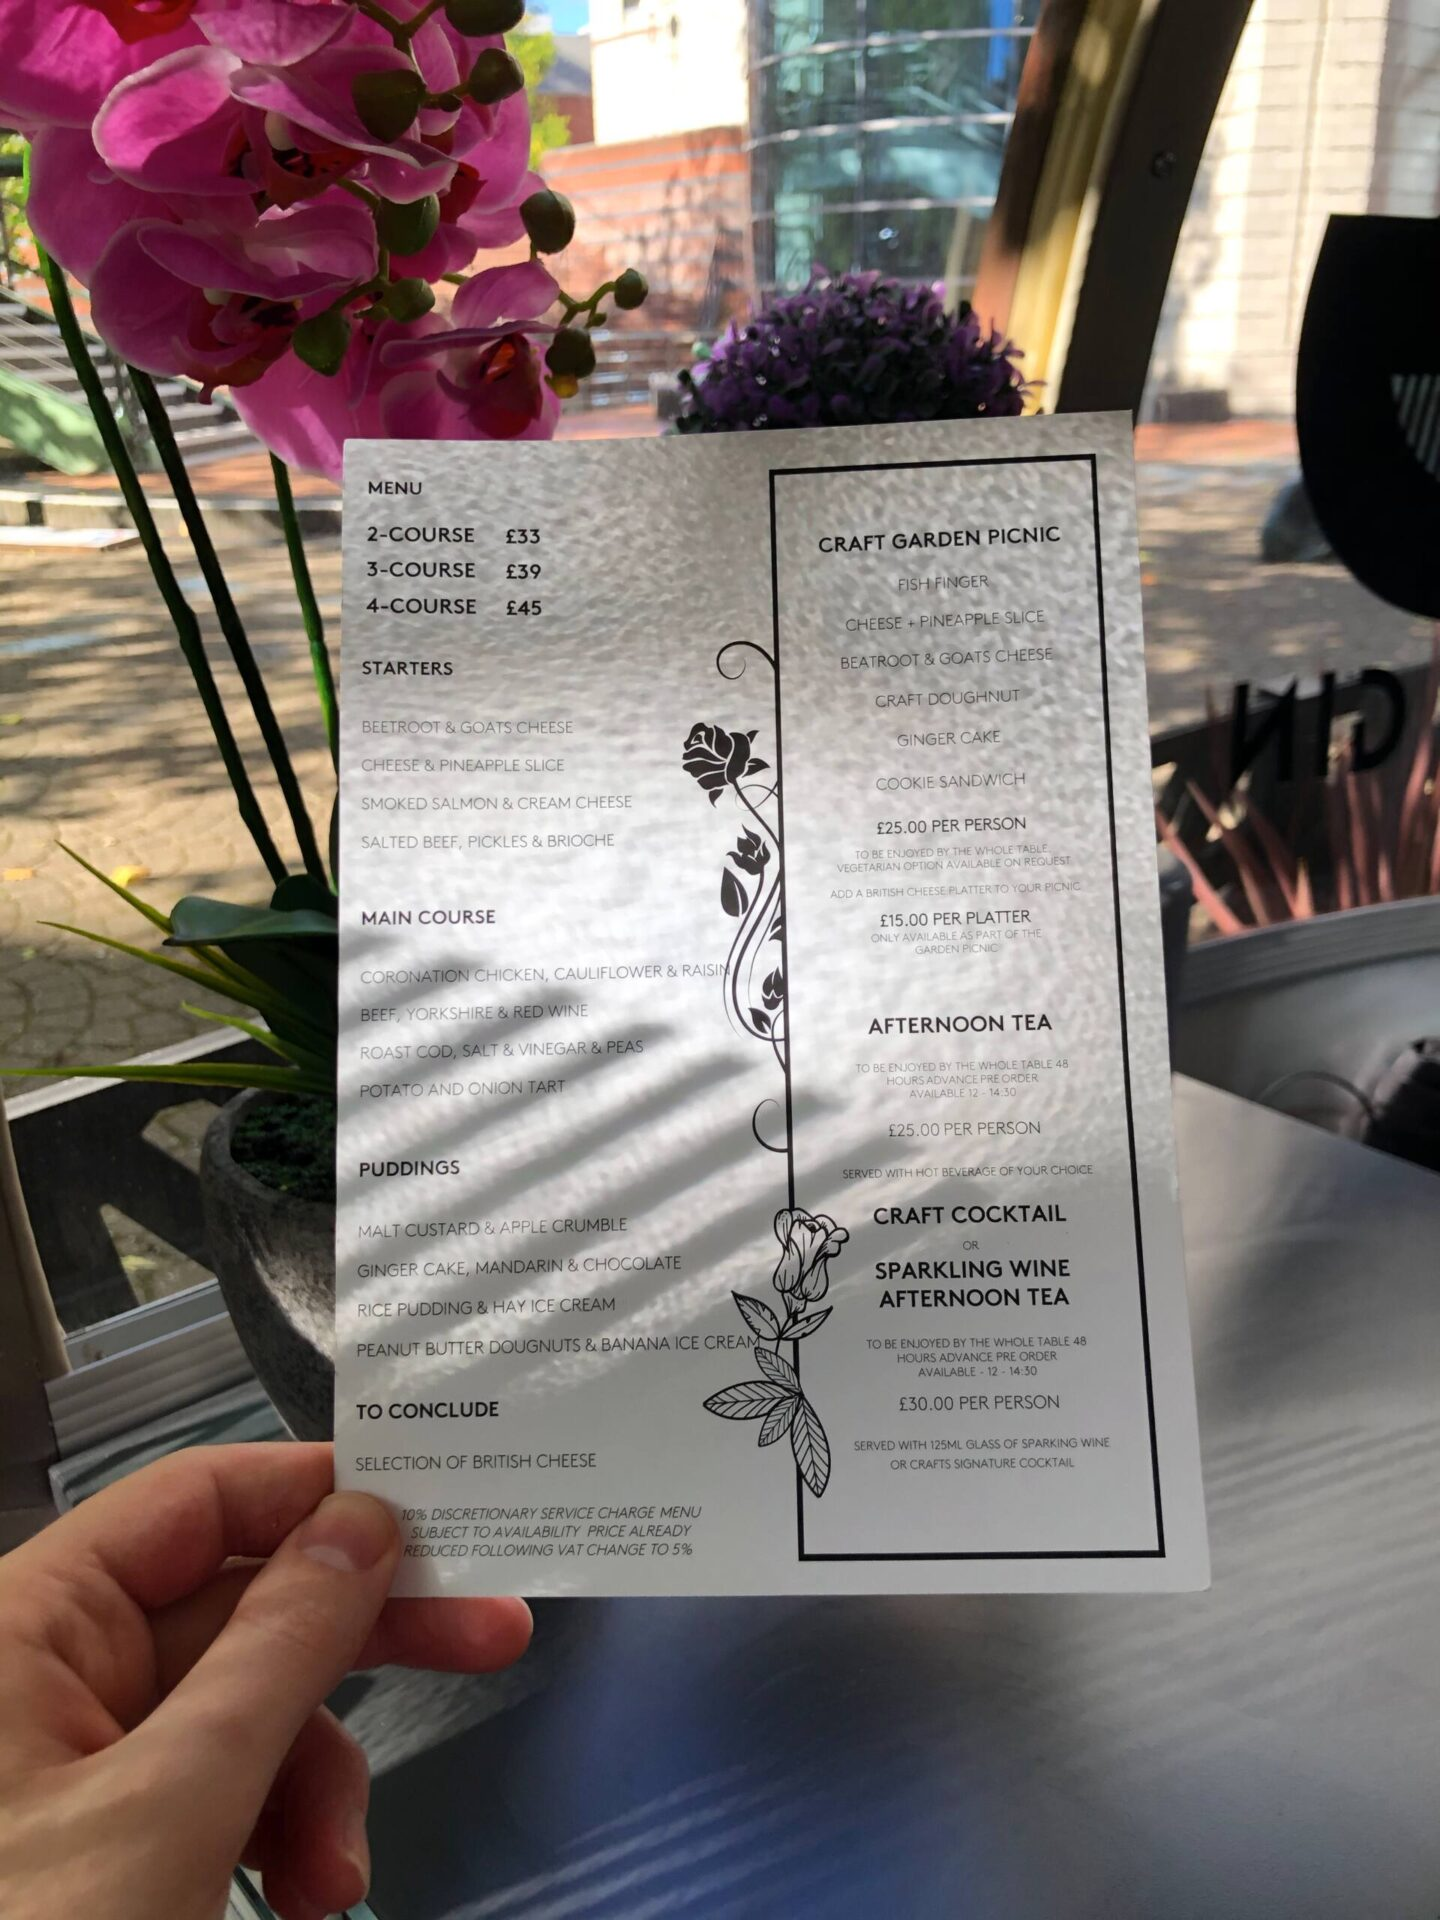 Craft Dining Birmingham menu